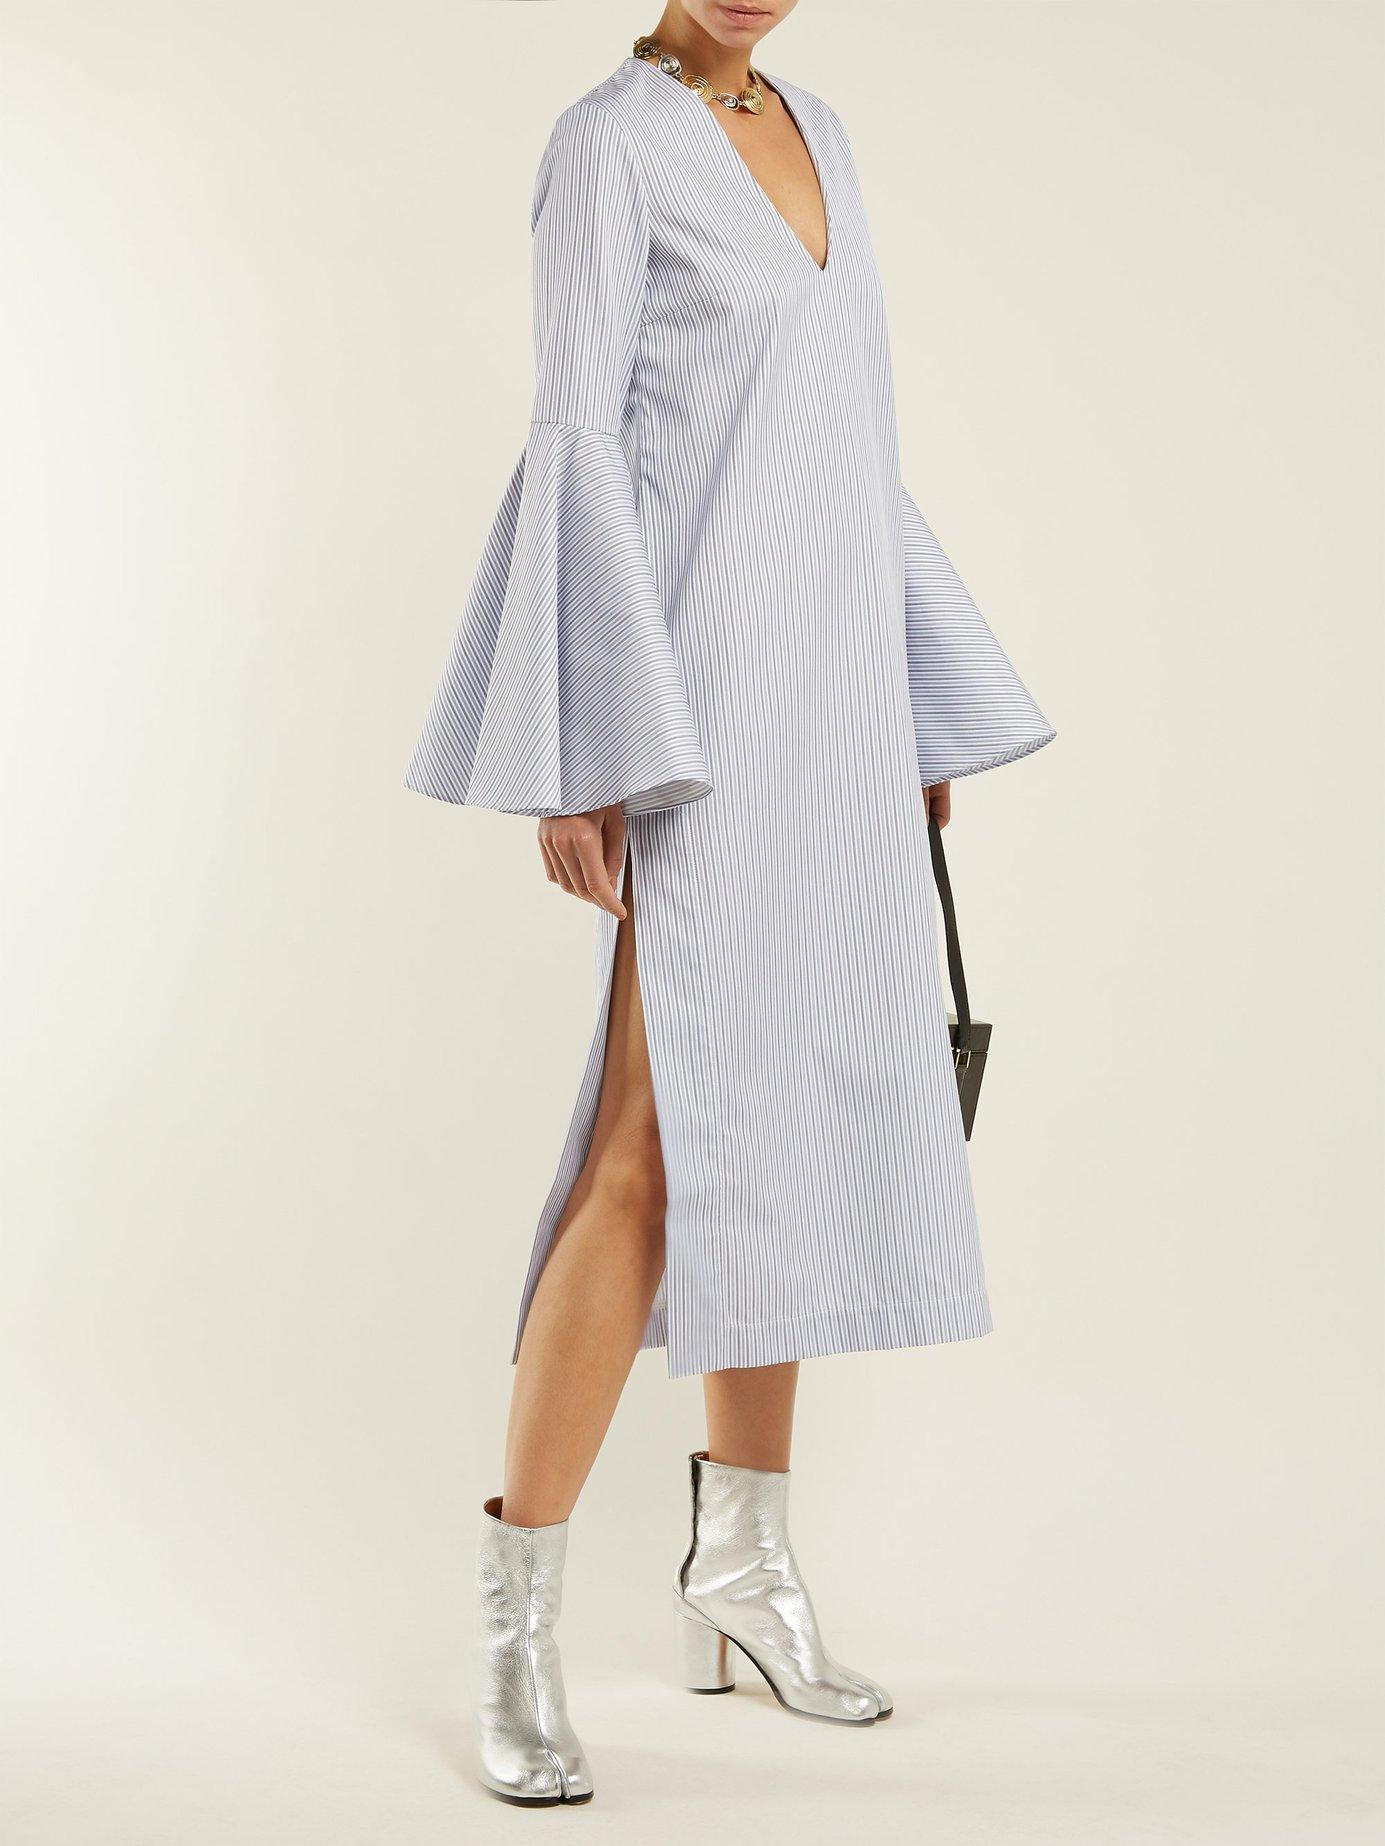 Hildeberg V-neck cotton dress by Ellery